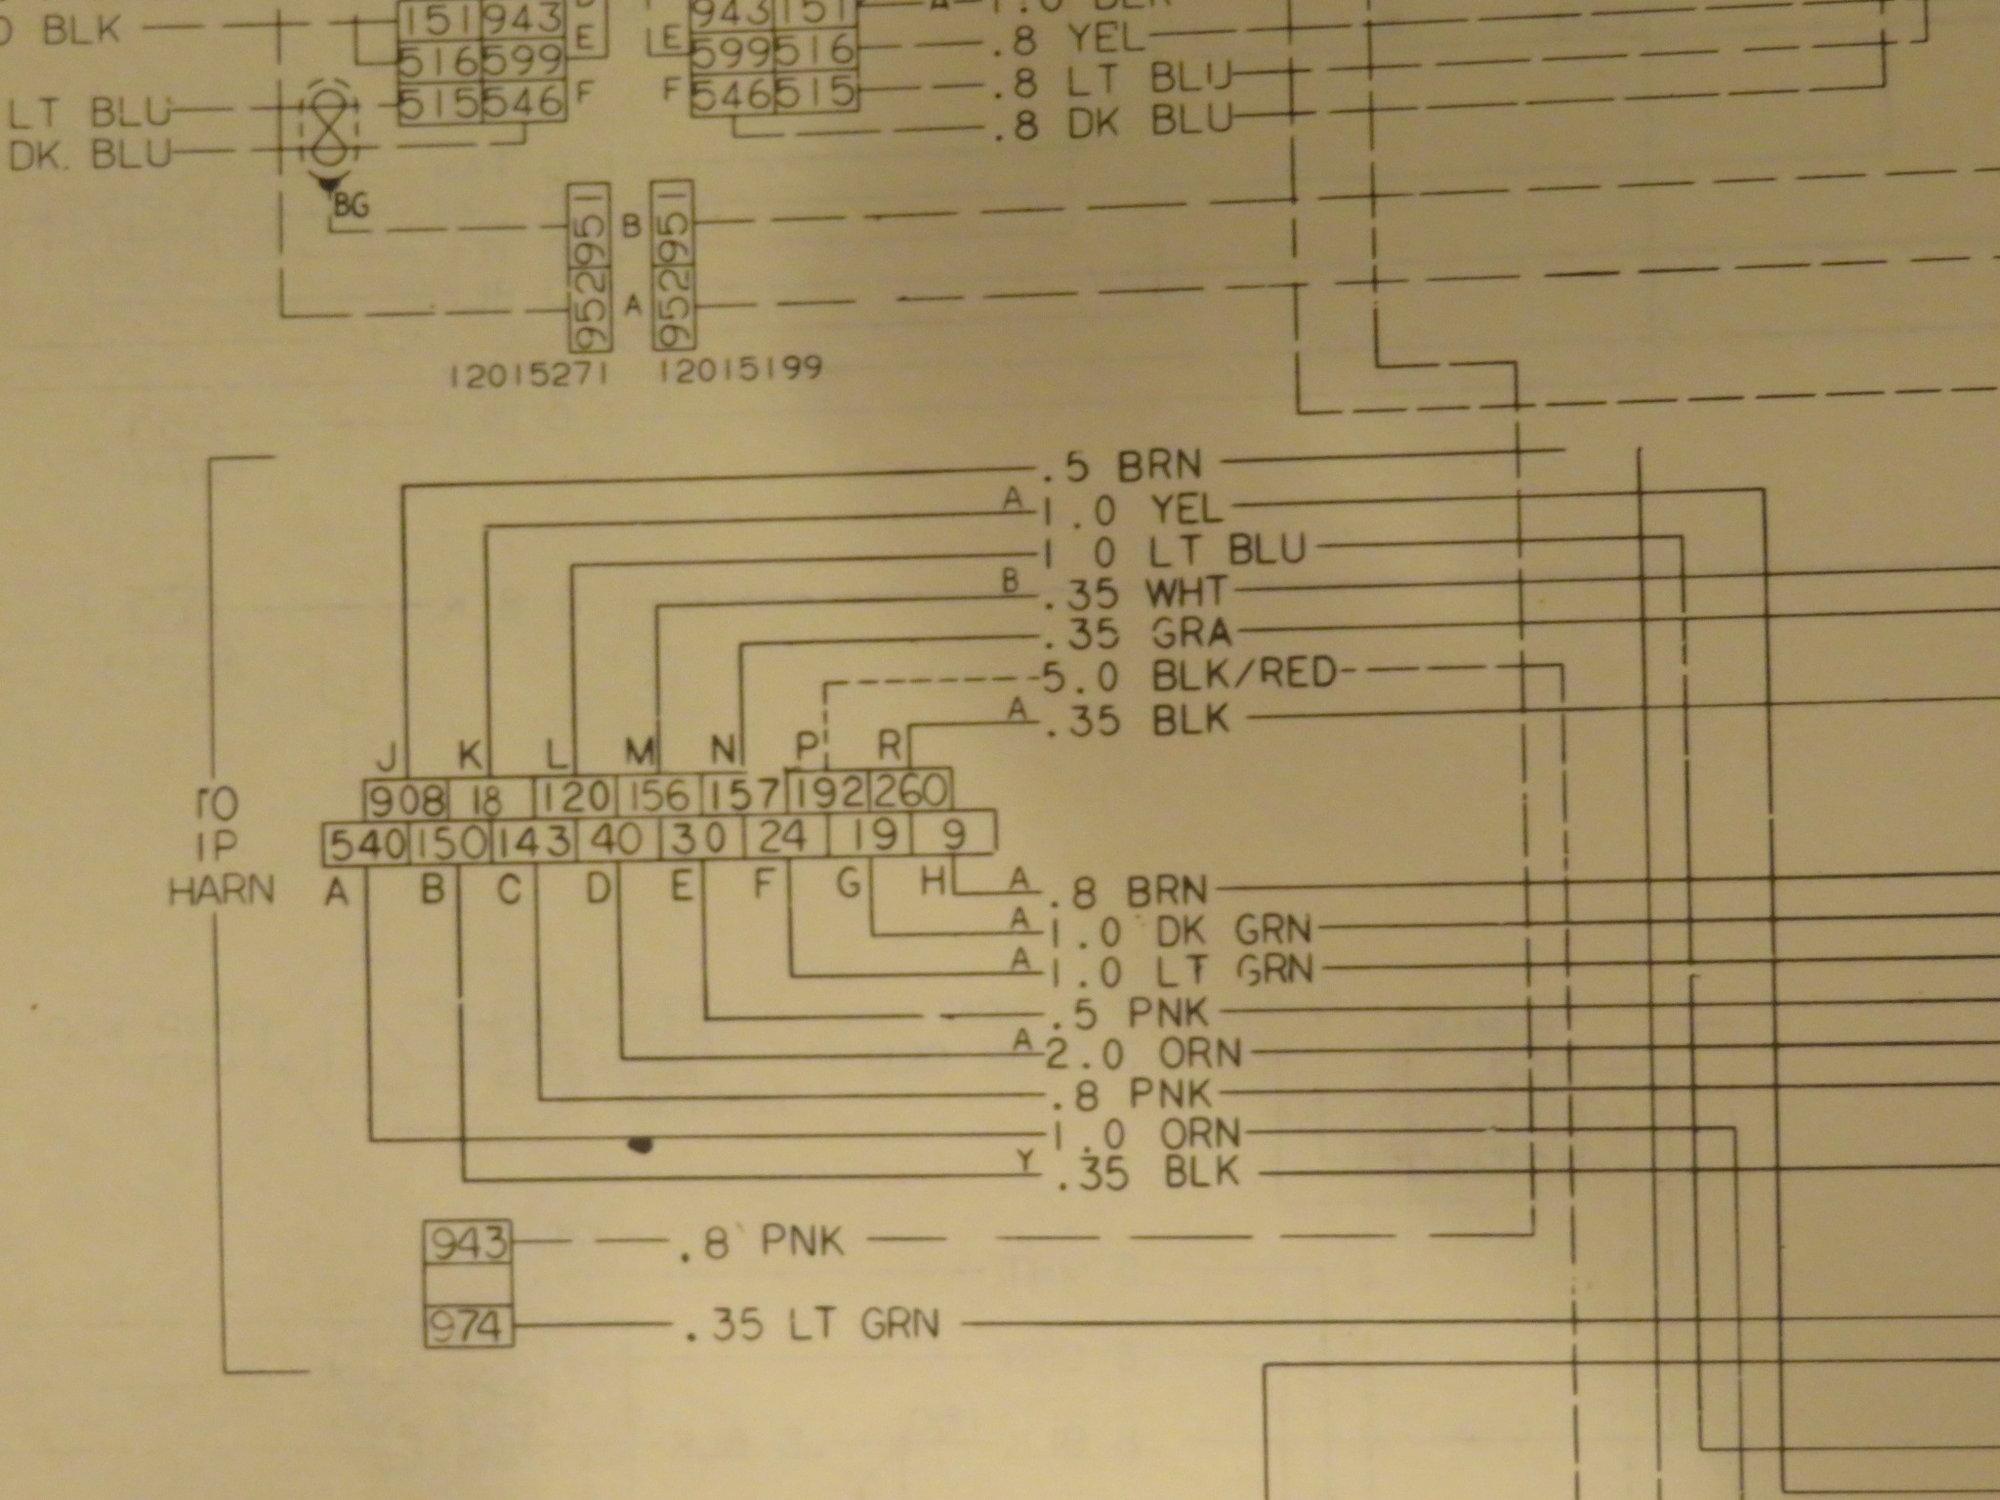 1995 Ford F 150 Wiring Diagram Http Www2carproscom Questions Ford